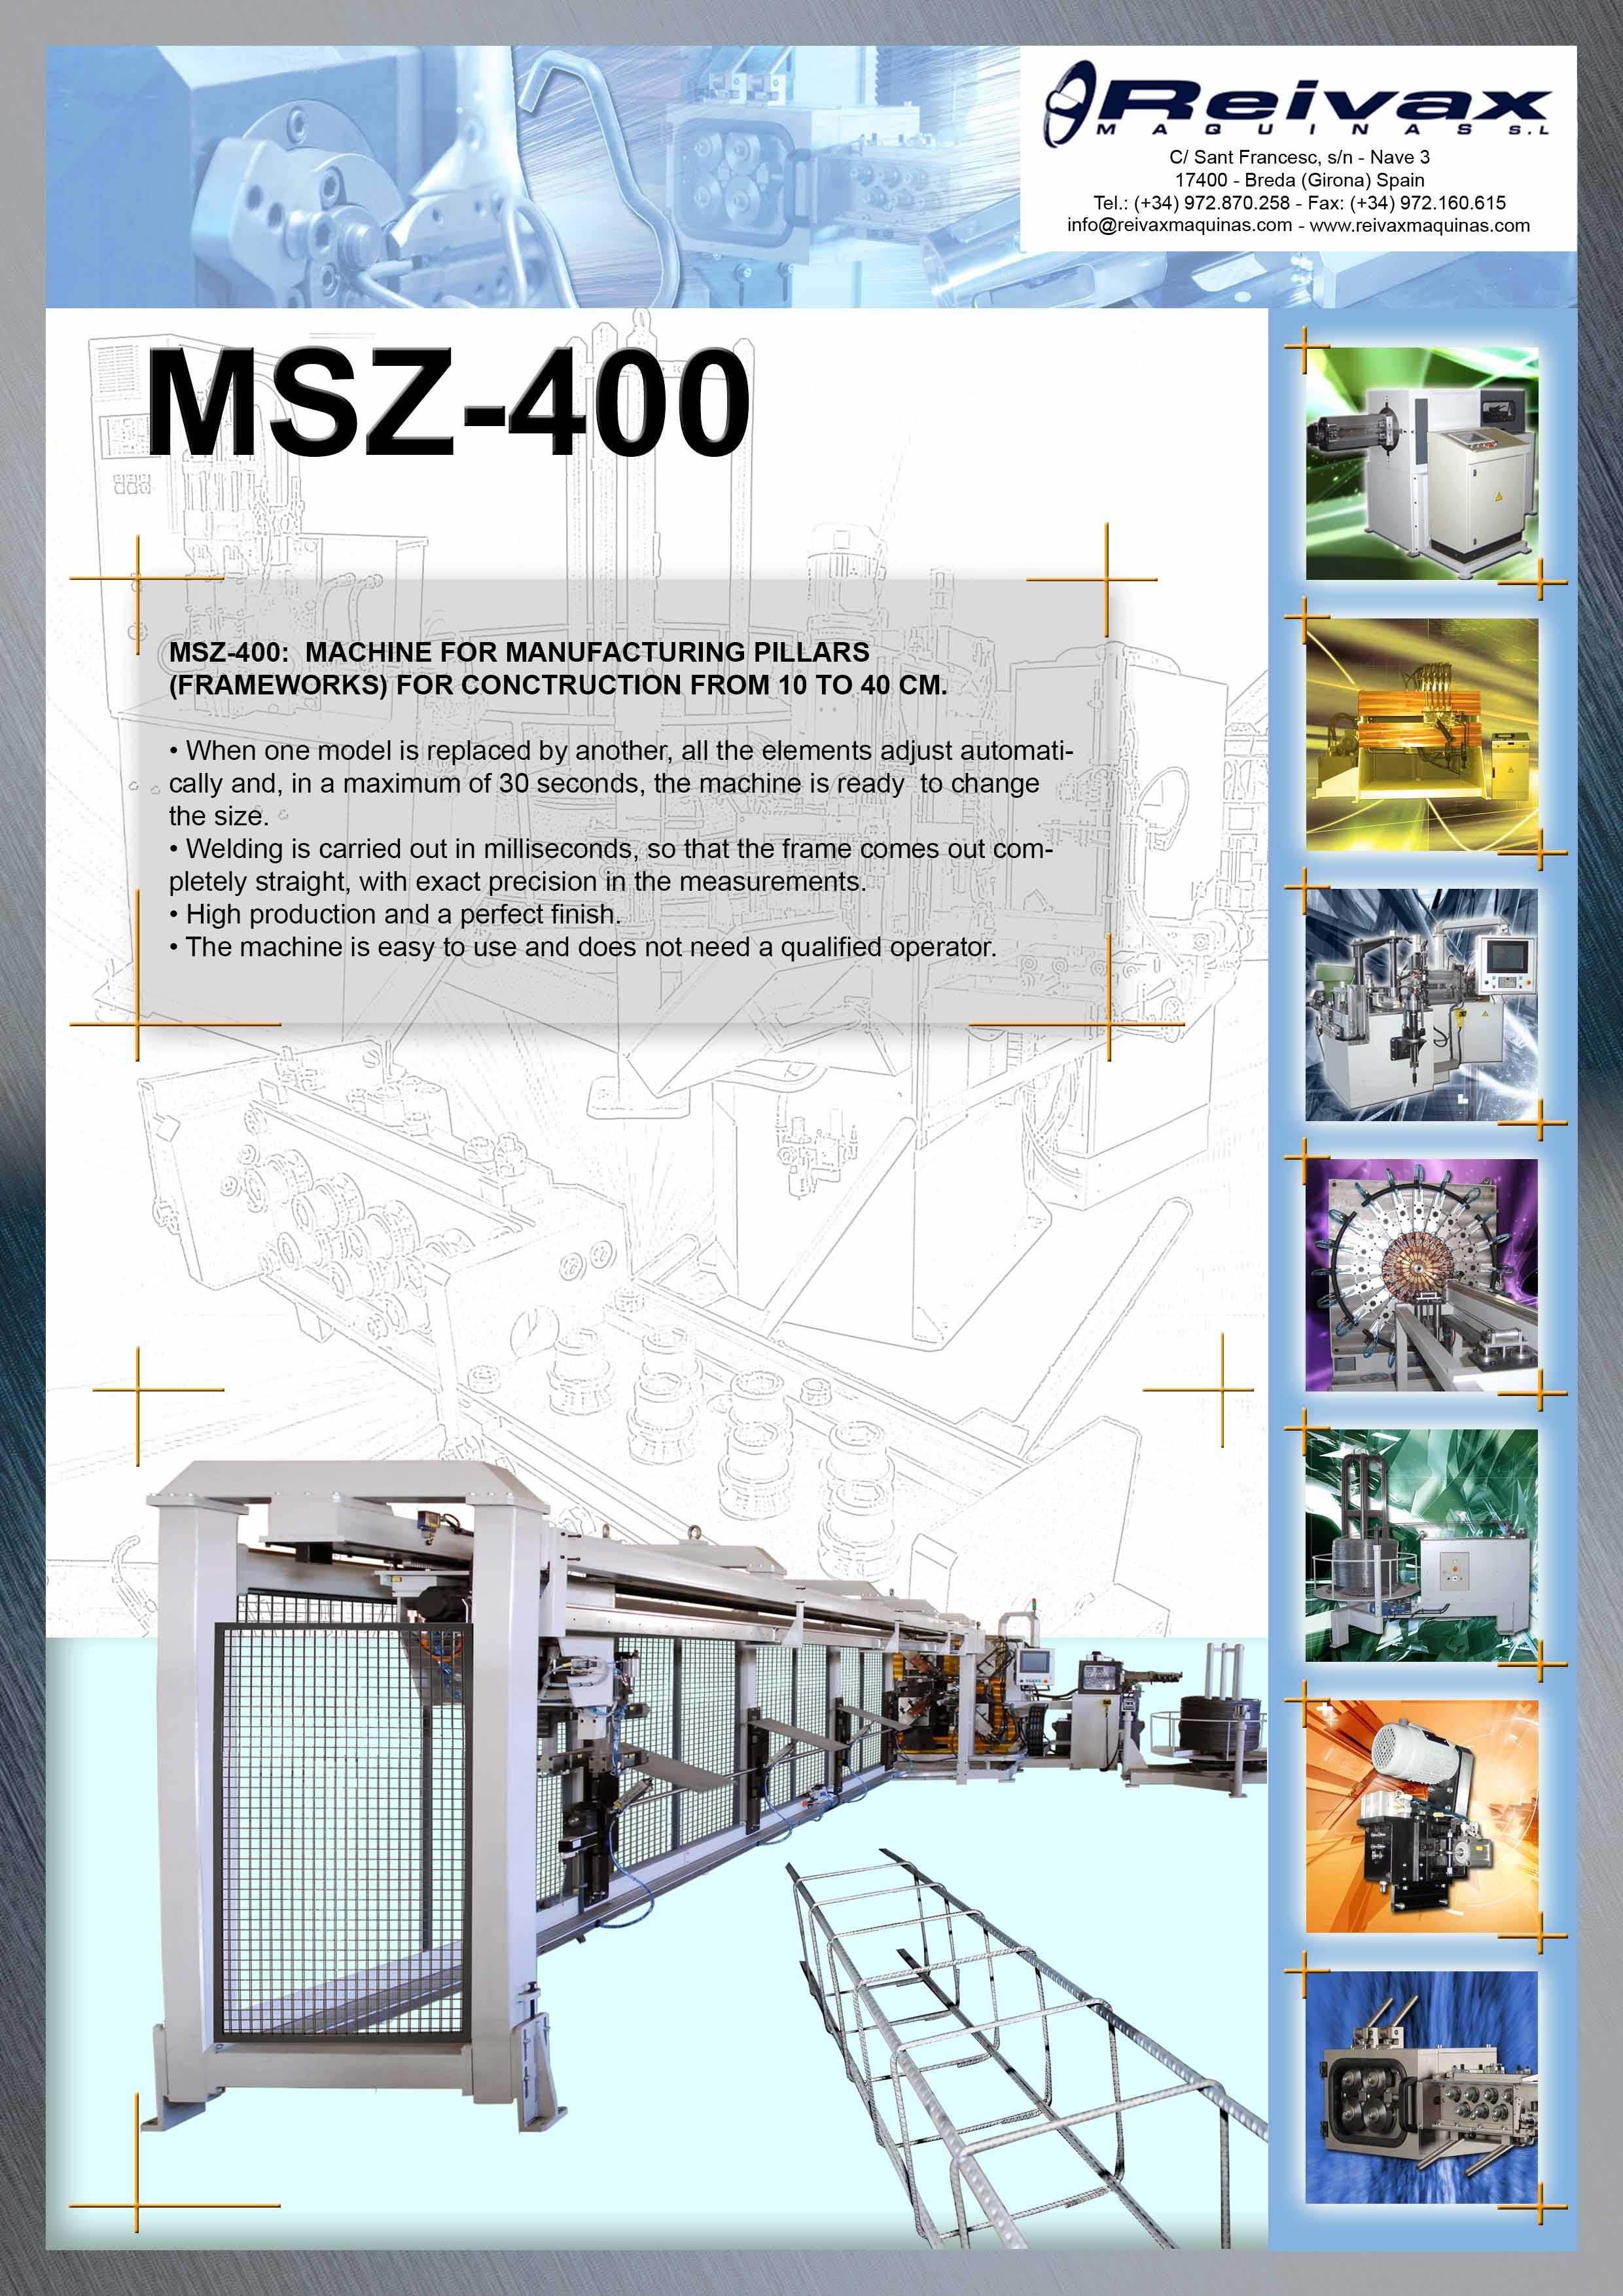 ReivaxMaquinas: Technical Details MSZ-400